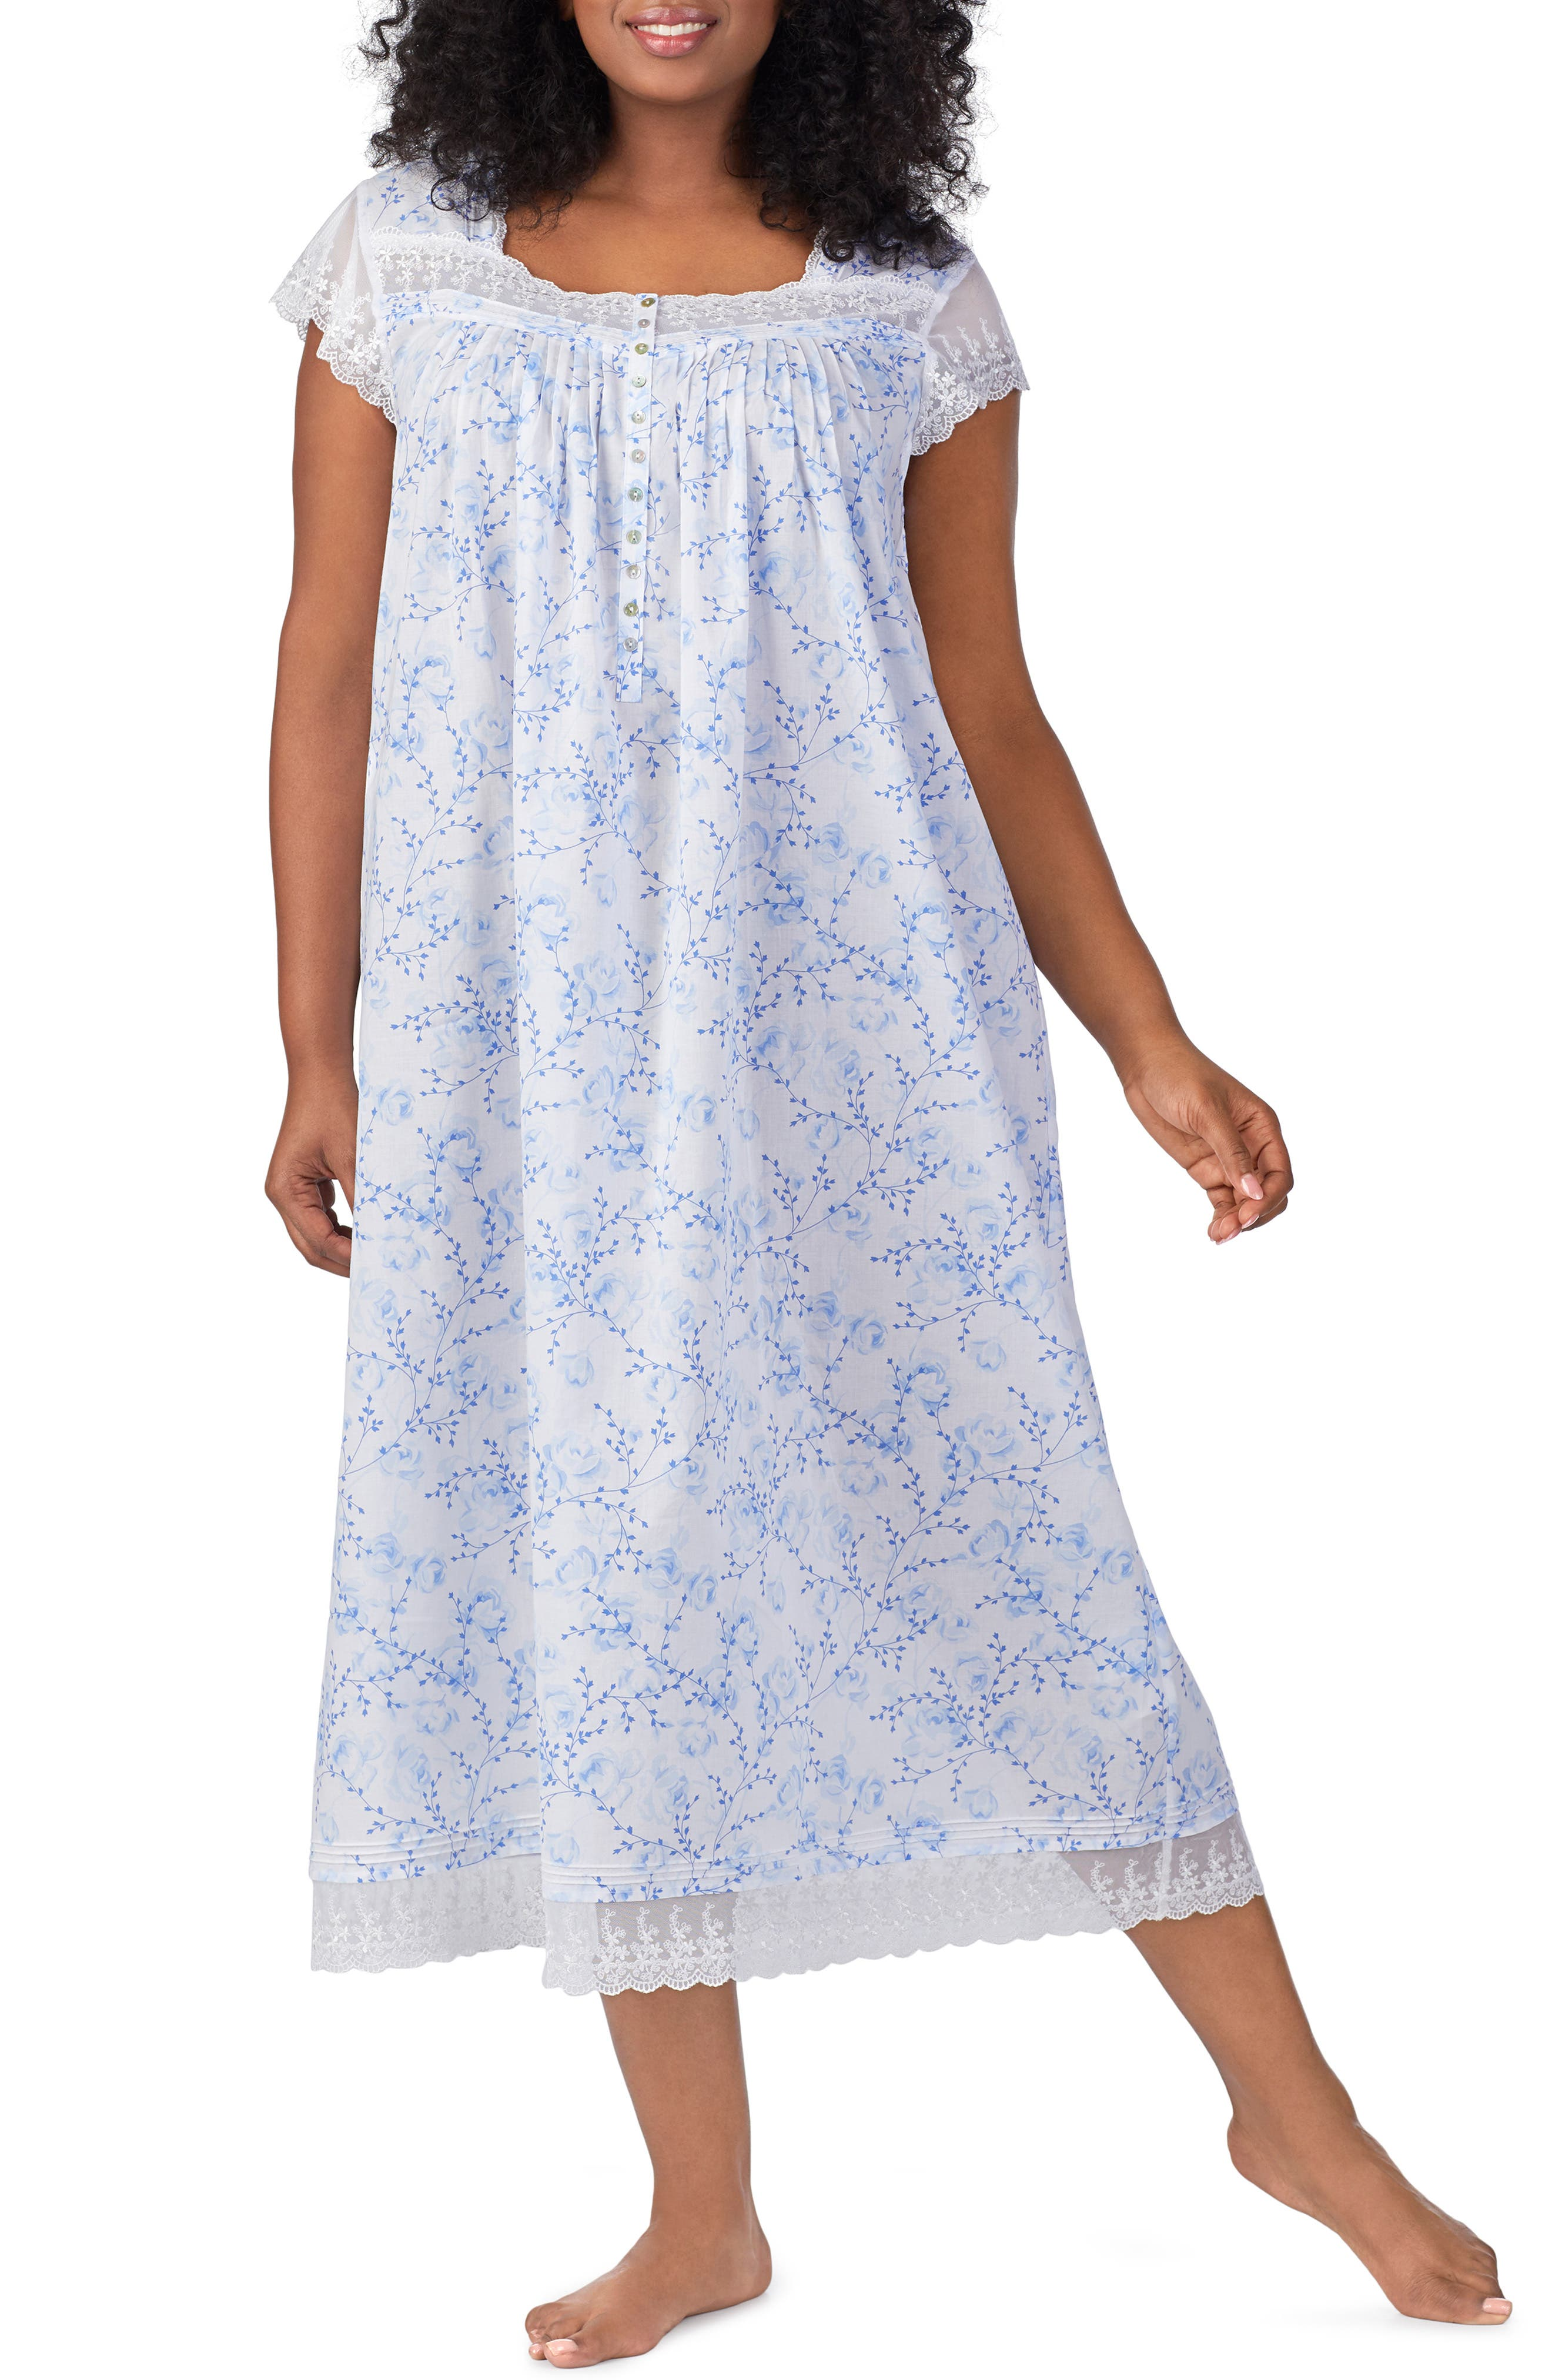 Cotton Lawn Nightgown,                             Main thumbnail 1, color,                             BLUE FLORAL